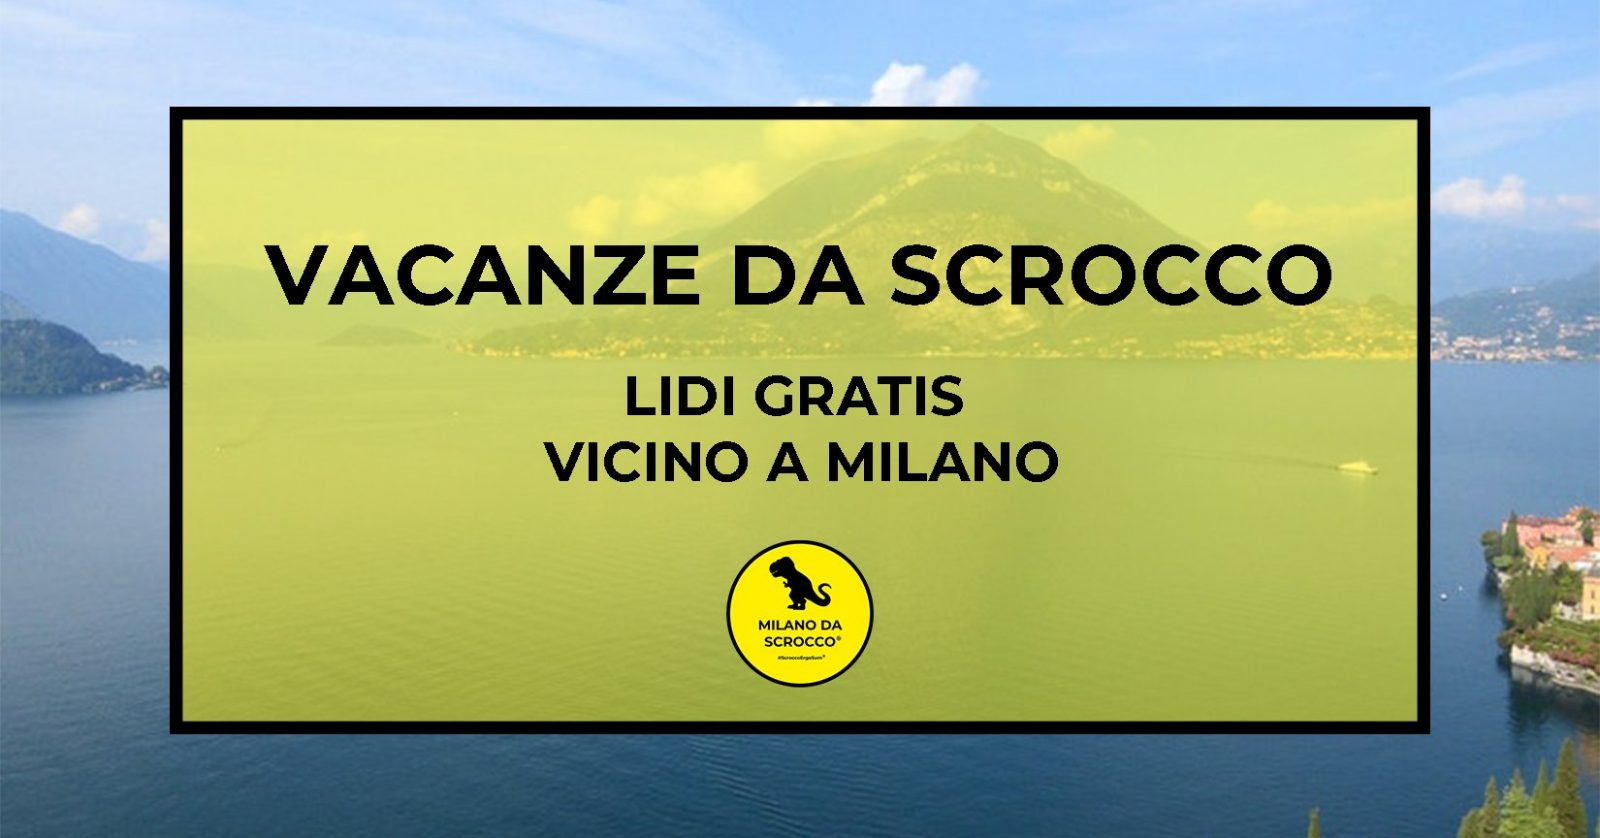 Vacanze da Scrocco: lidi gratis vicino a Milano